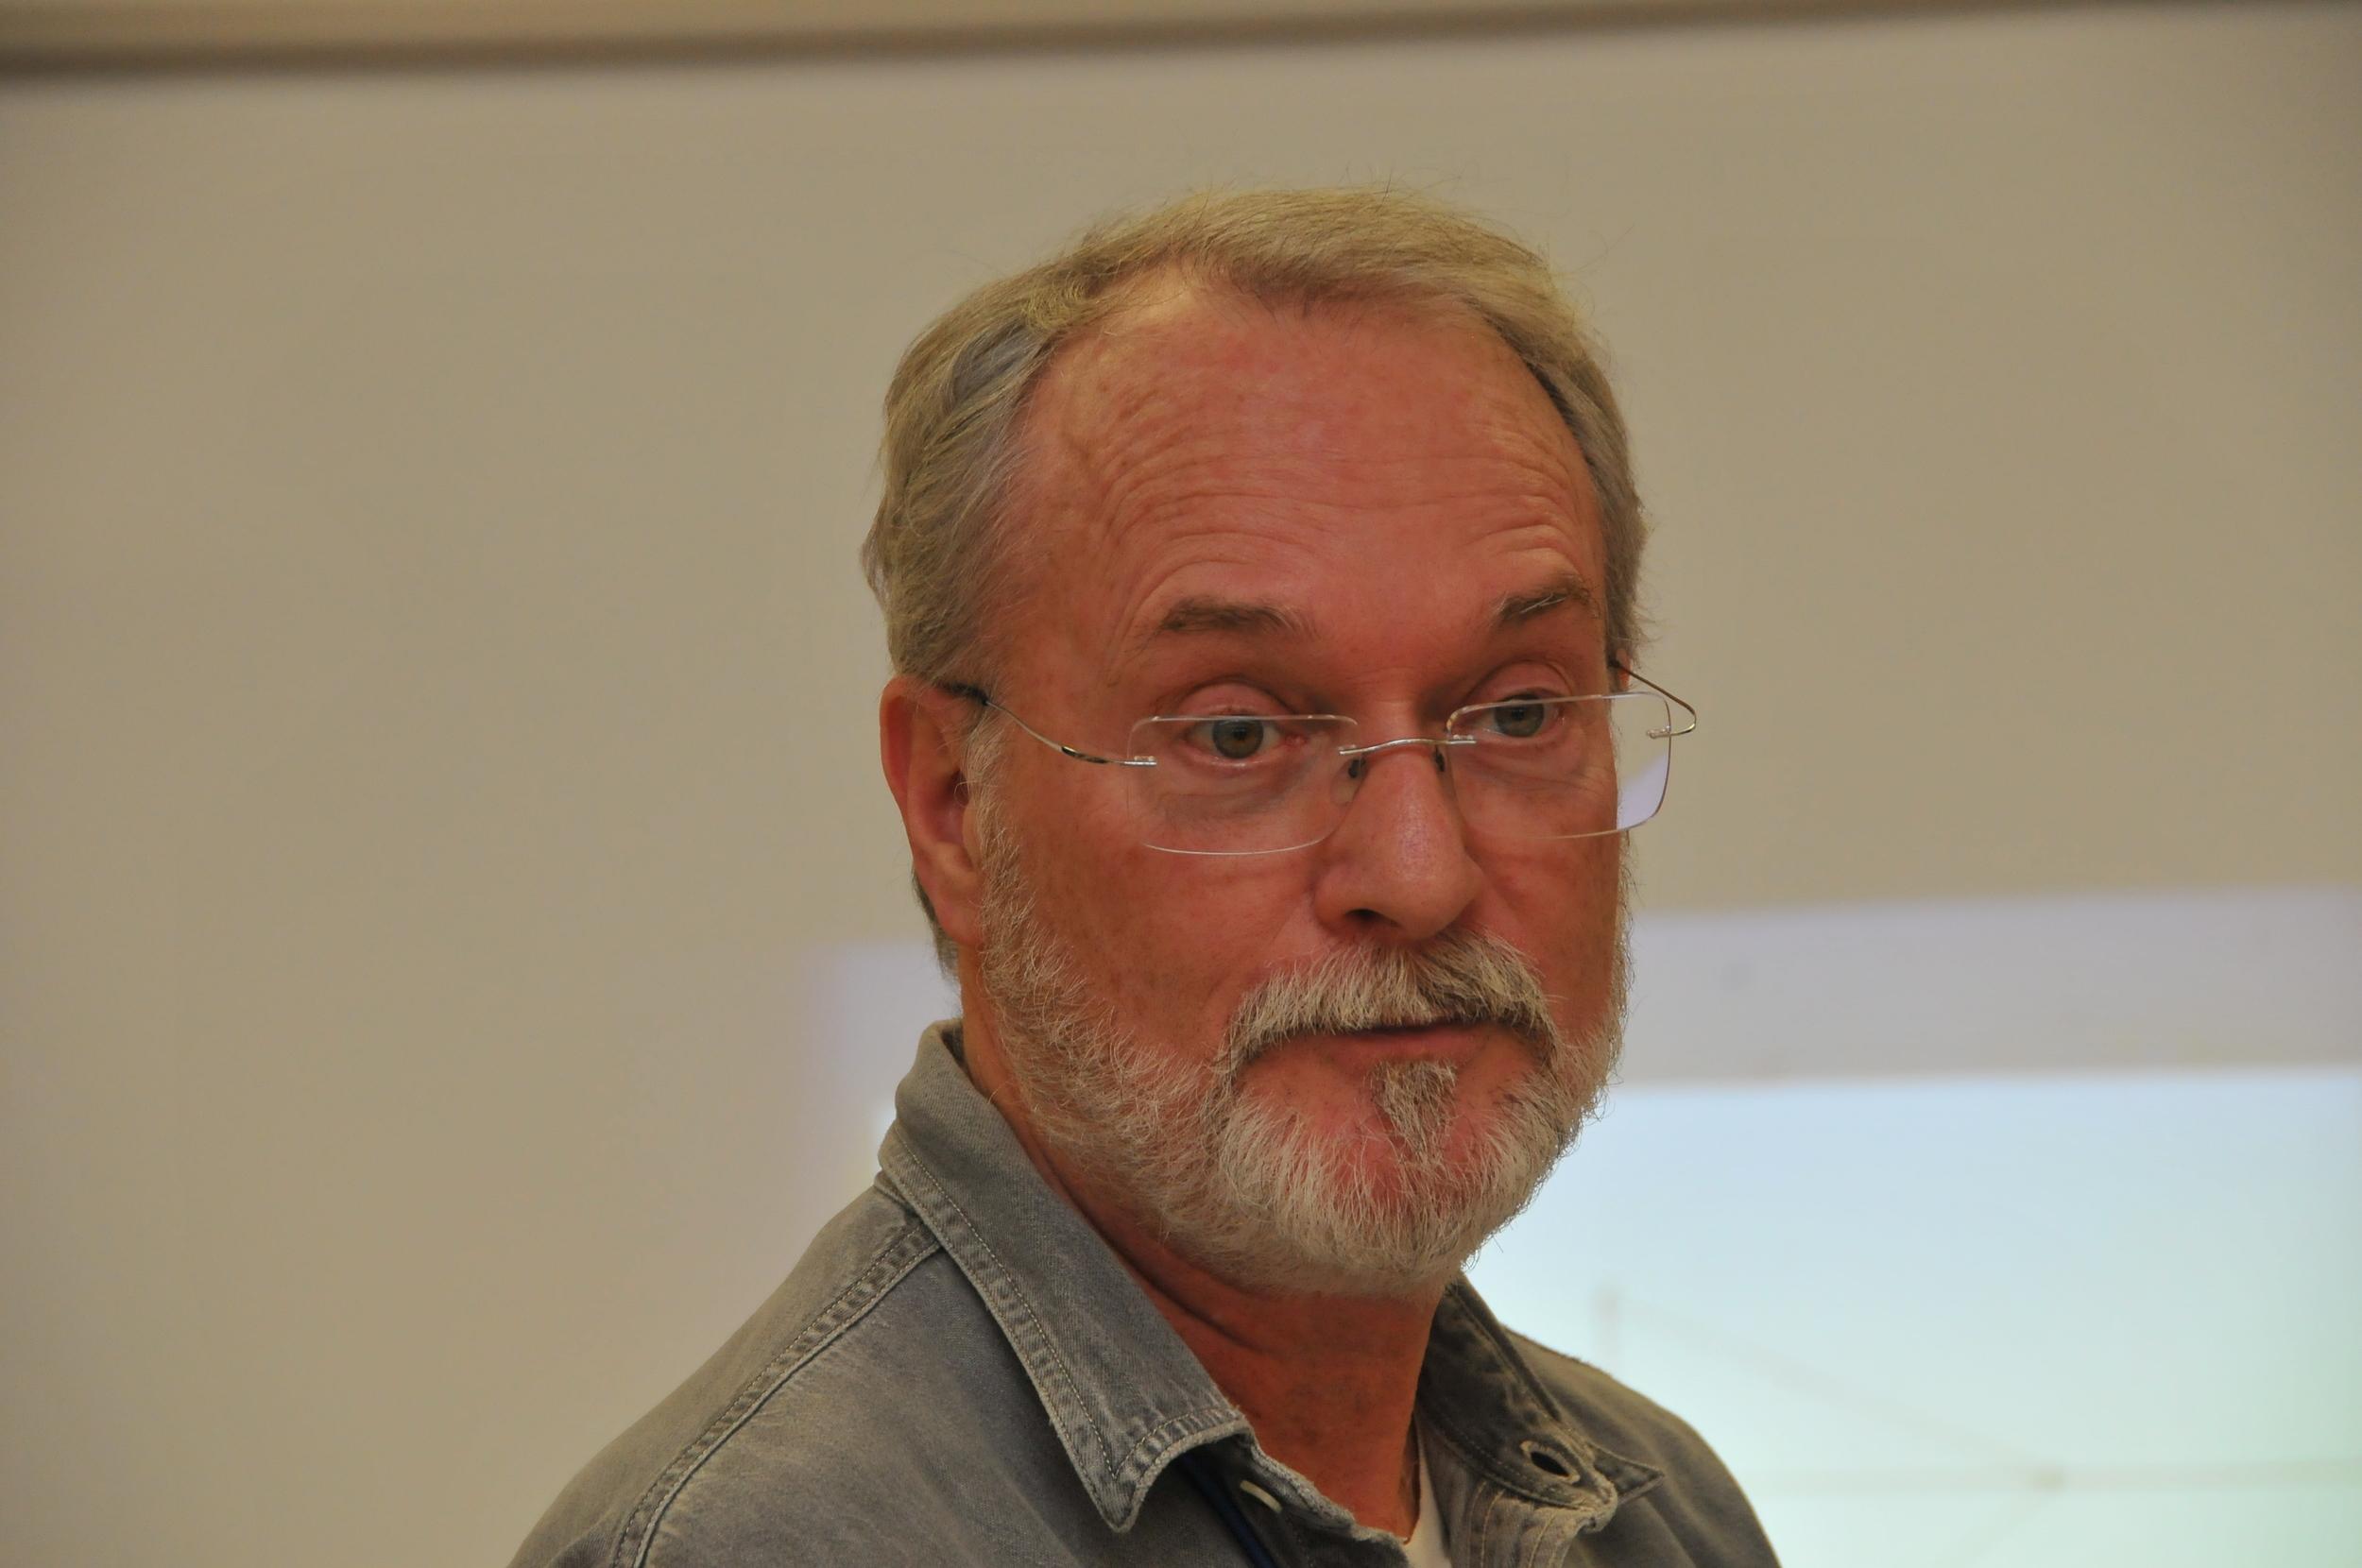 Charles Kellman